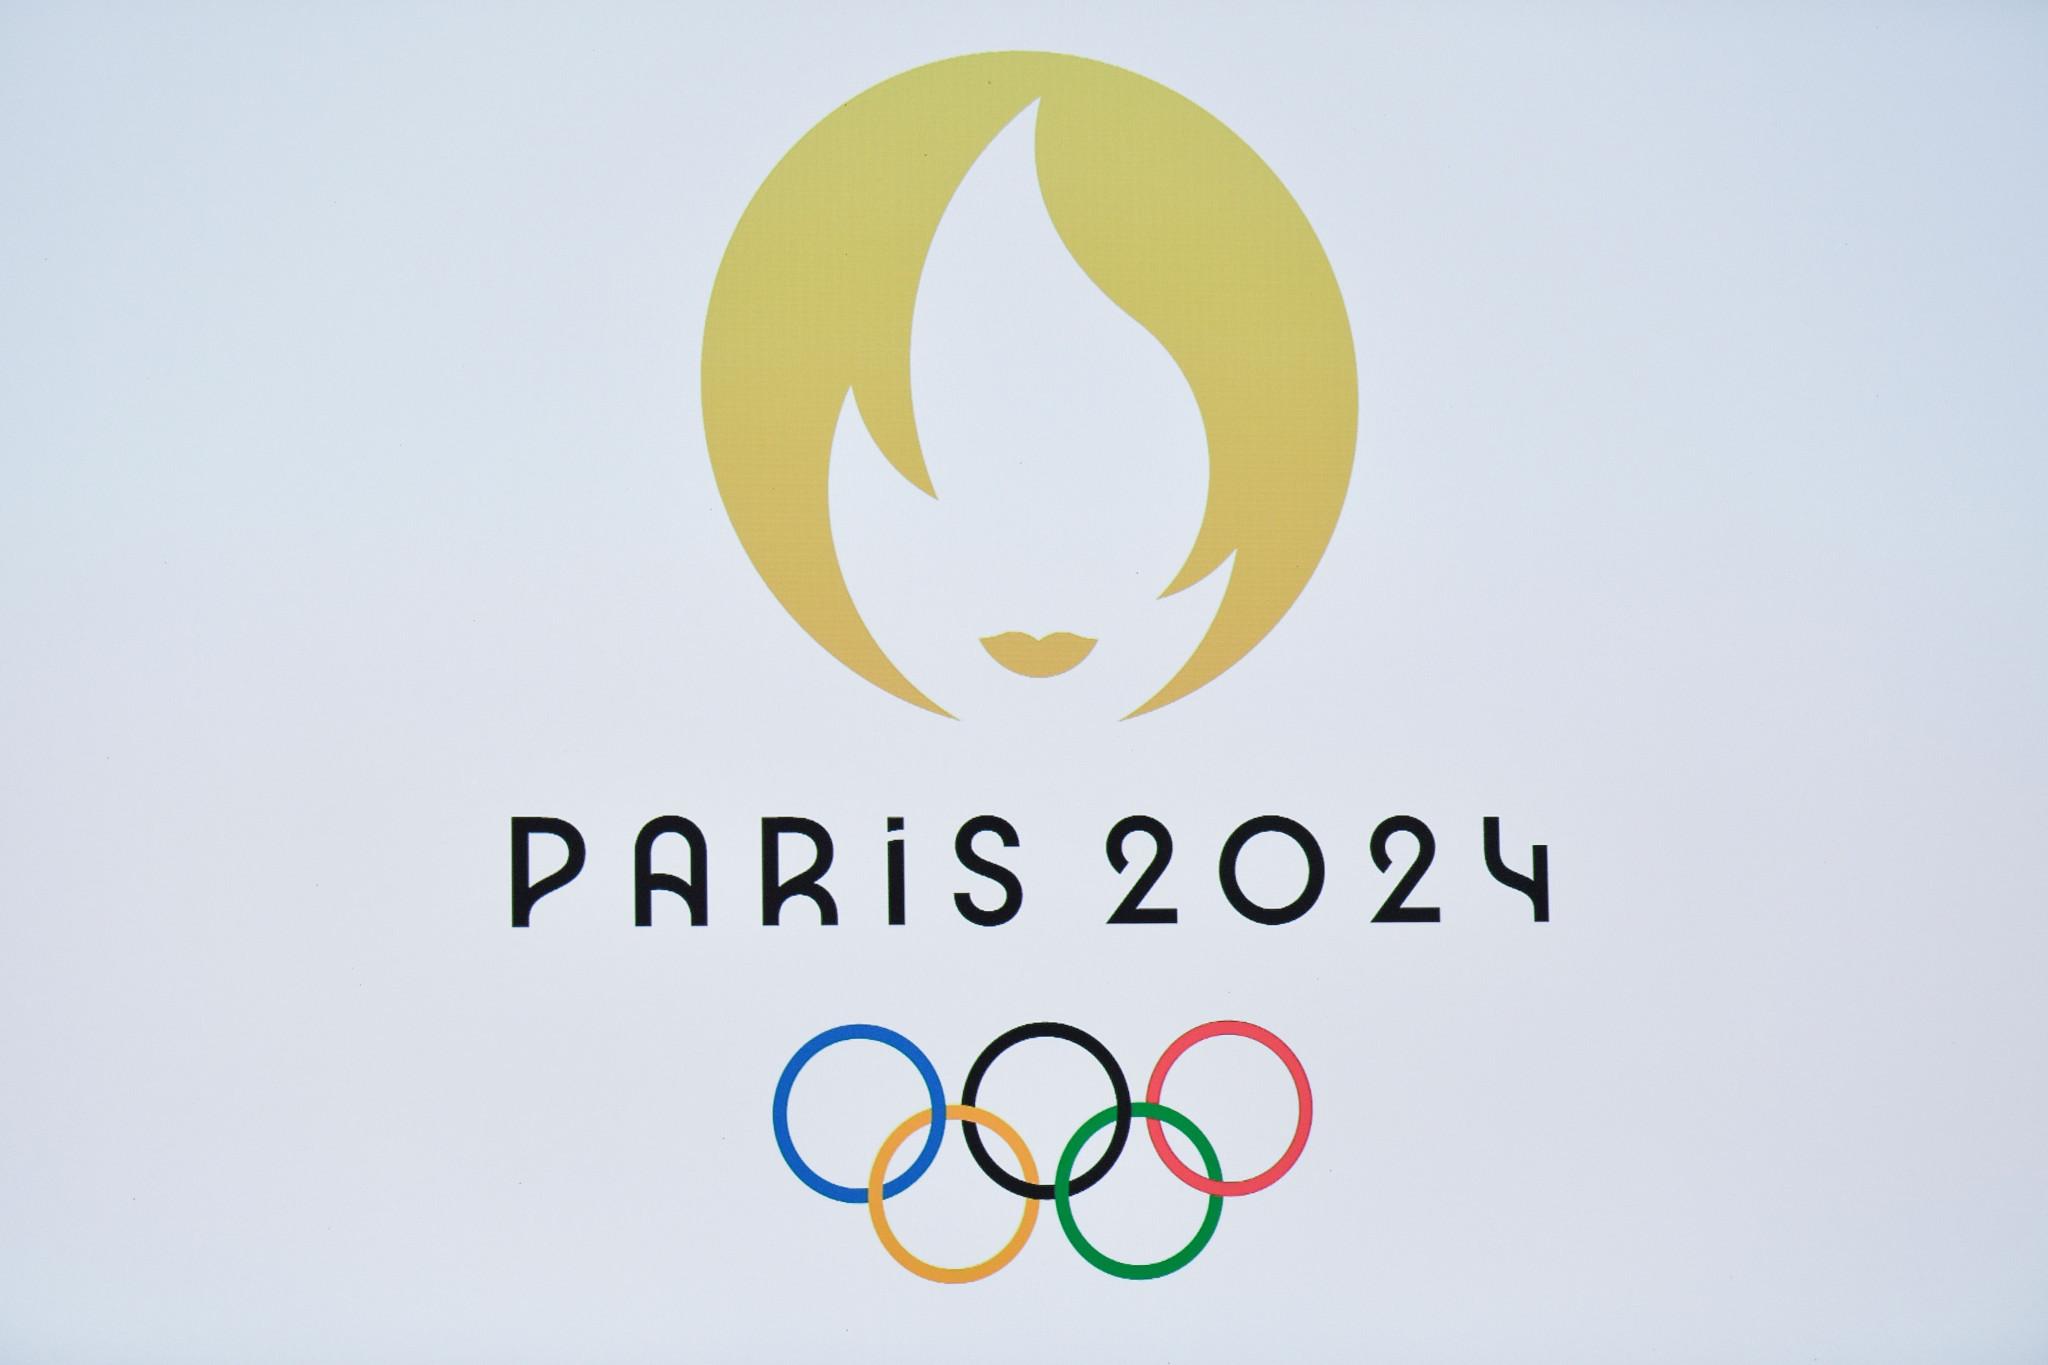 Paris 2024 organisers offer progress updates at IOC Session